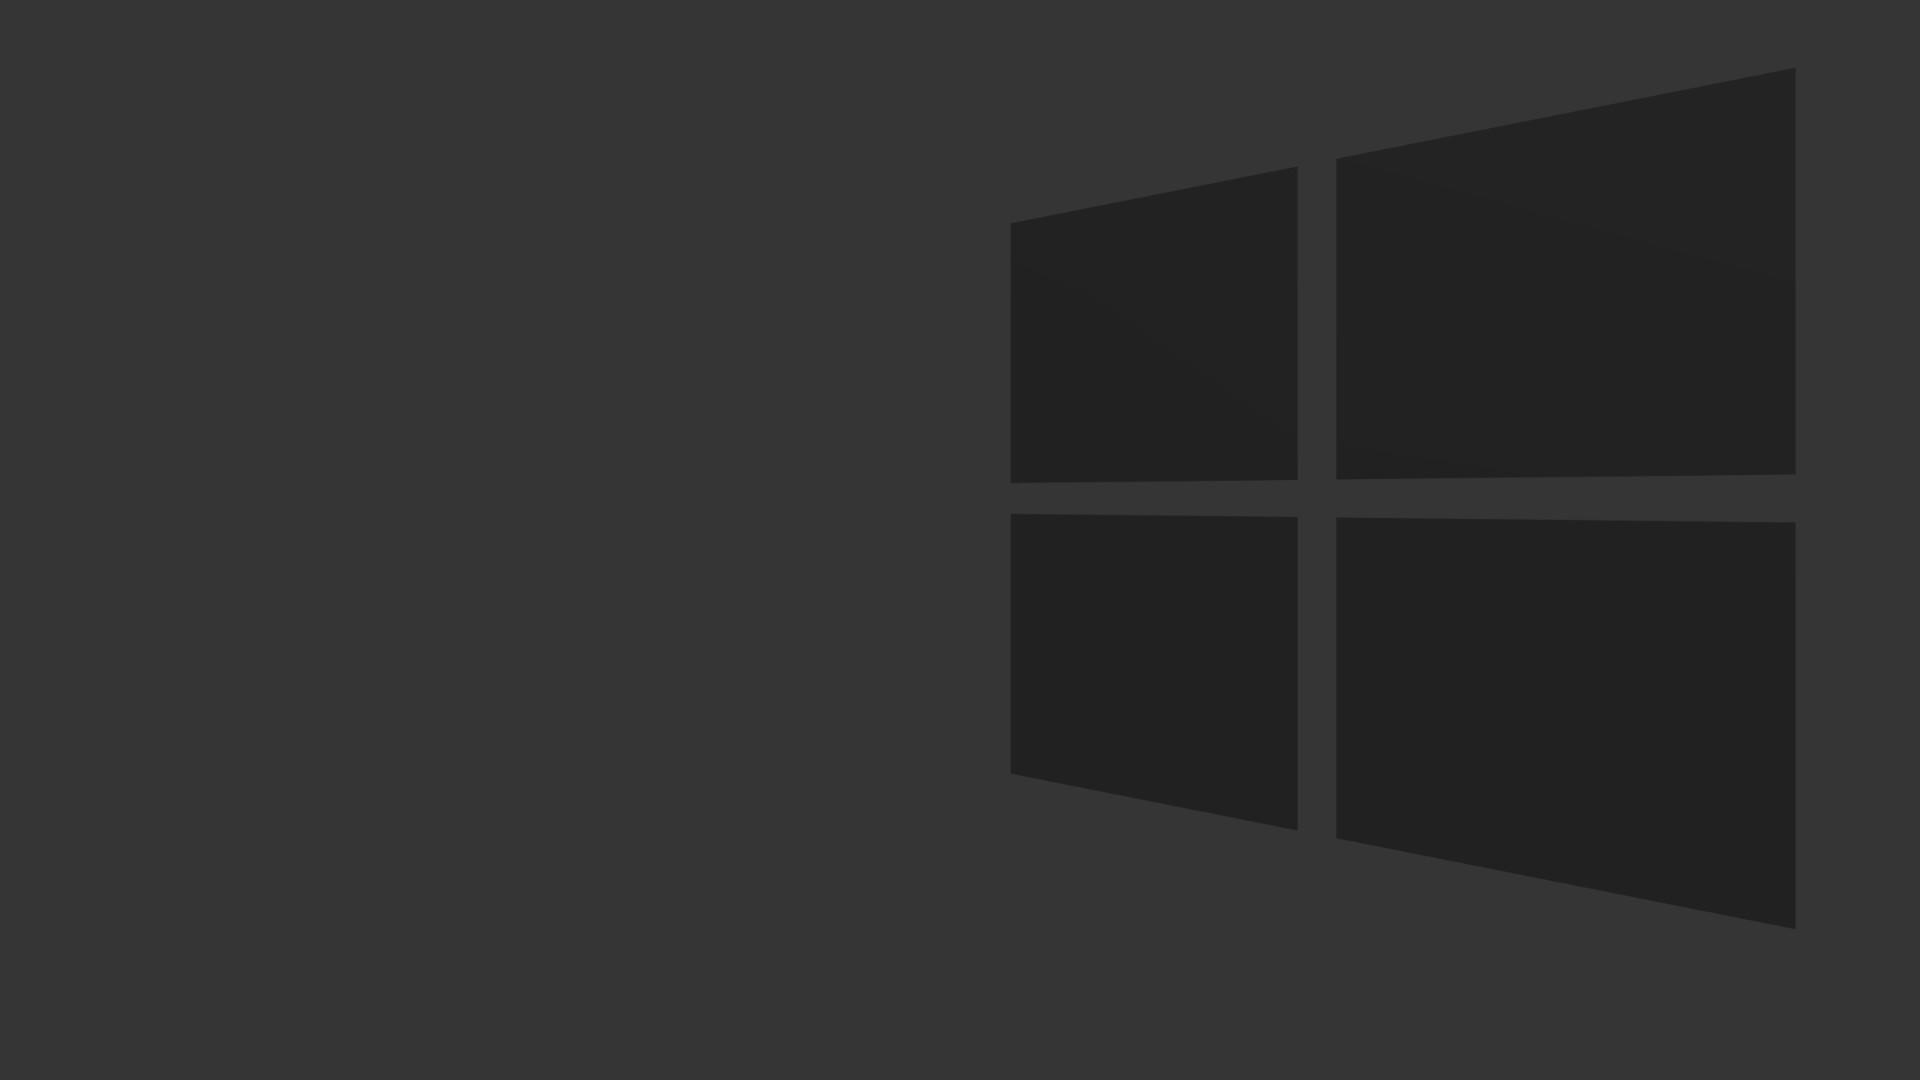 Microsoft Windows Desktop Backgrounds 65 images